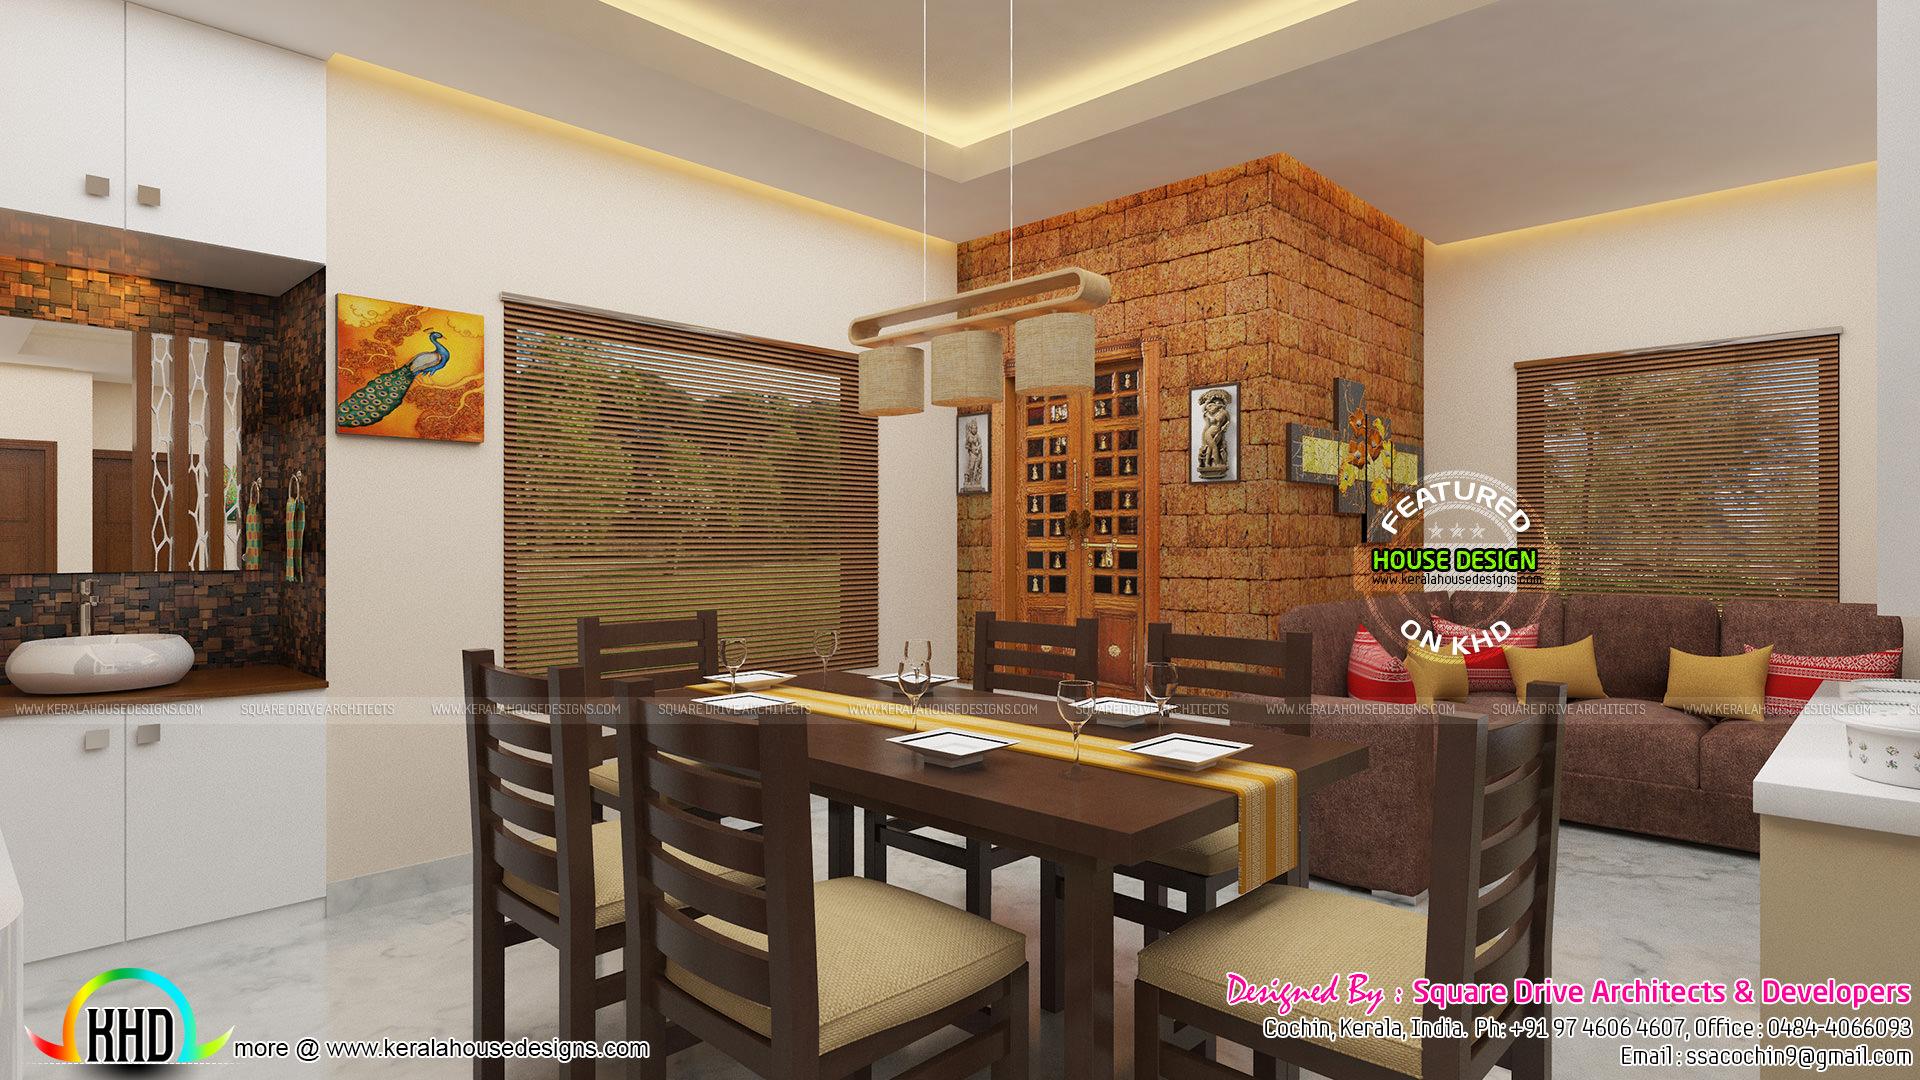 Awesome interior of dining area - Home Design Decor